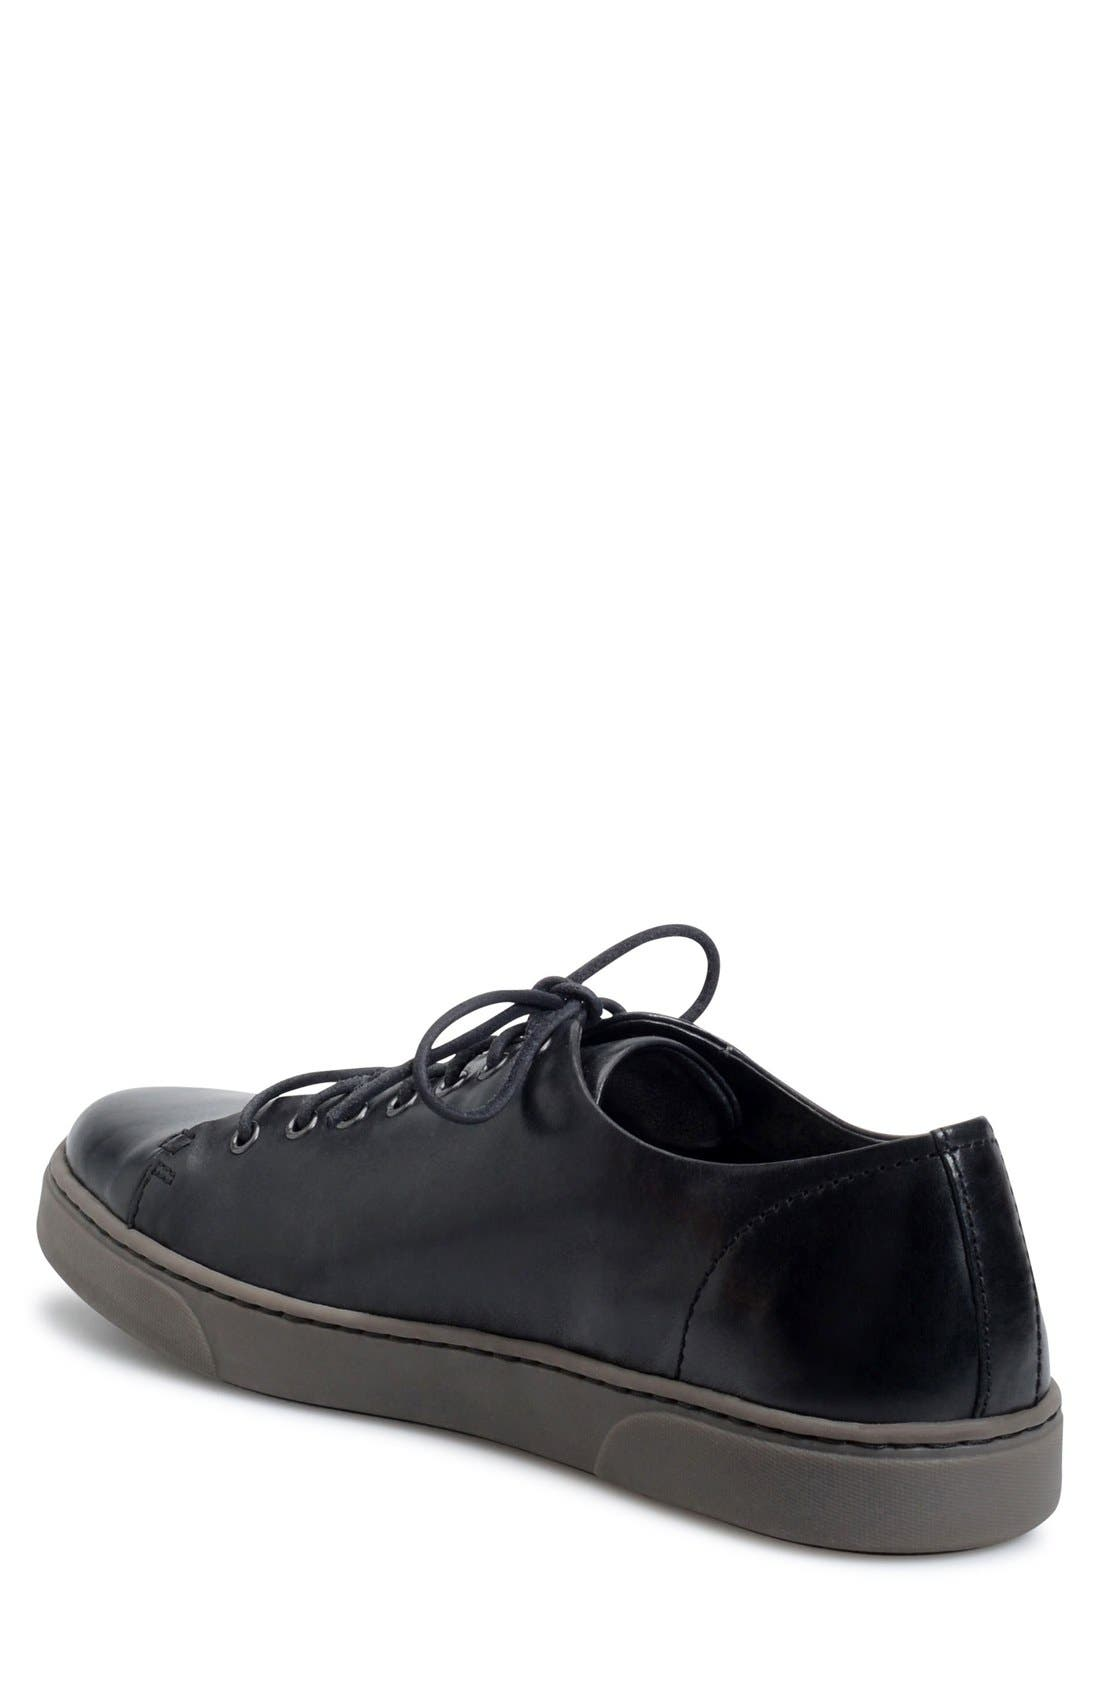 'Bayne' Cap Toe Sneaker,                             Alternate thumbnail 2, color,                             001